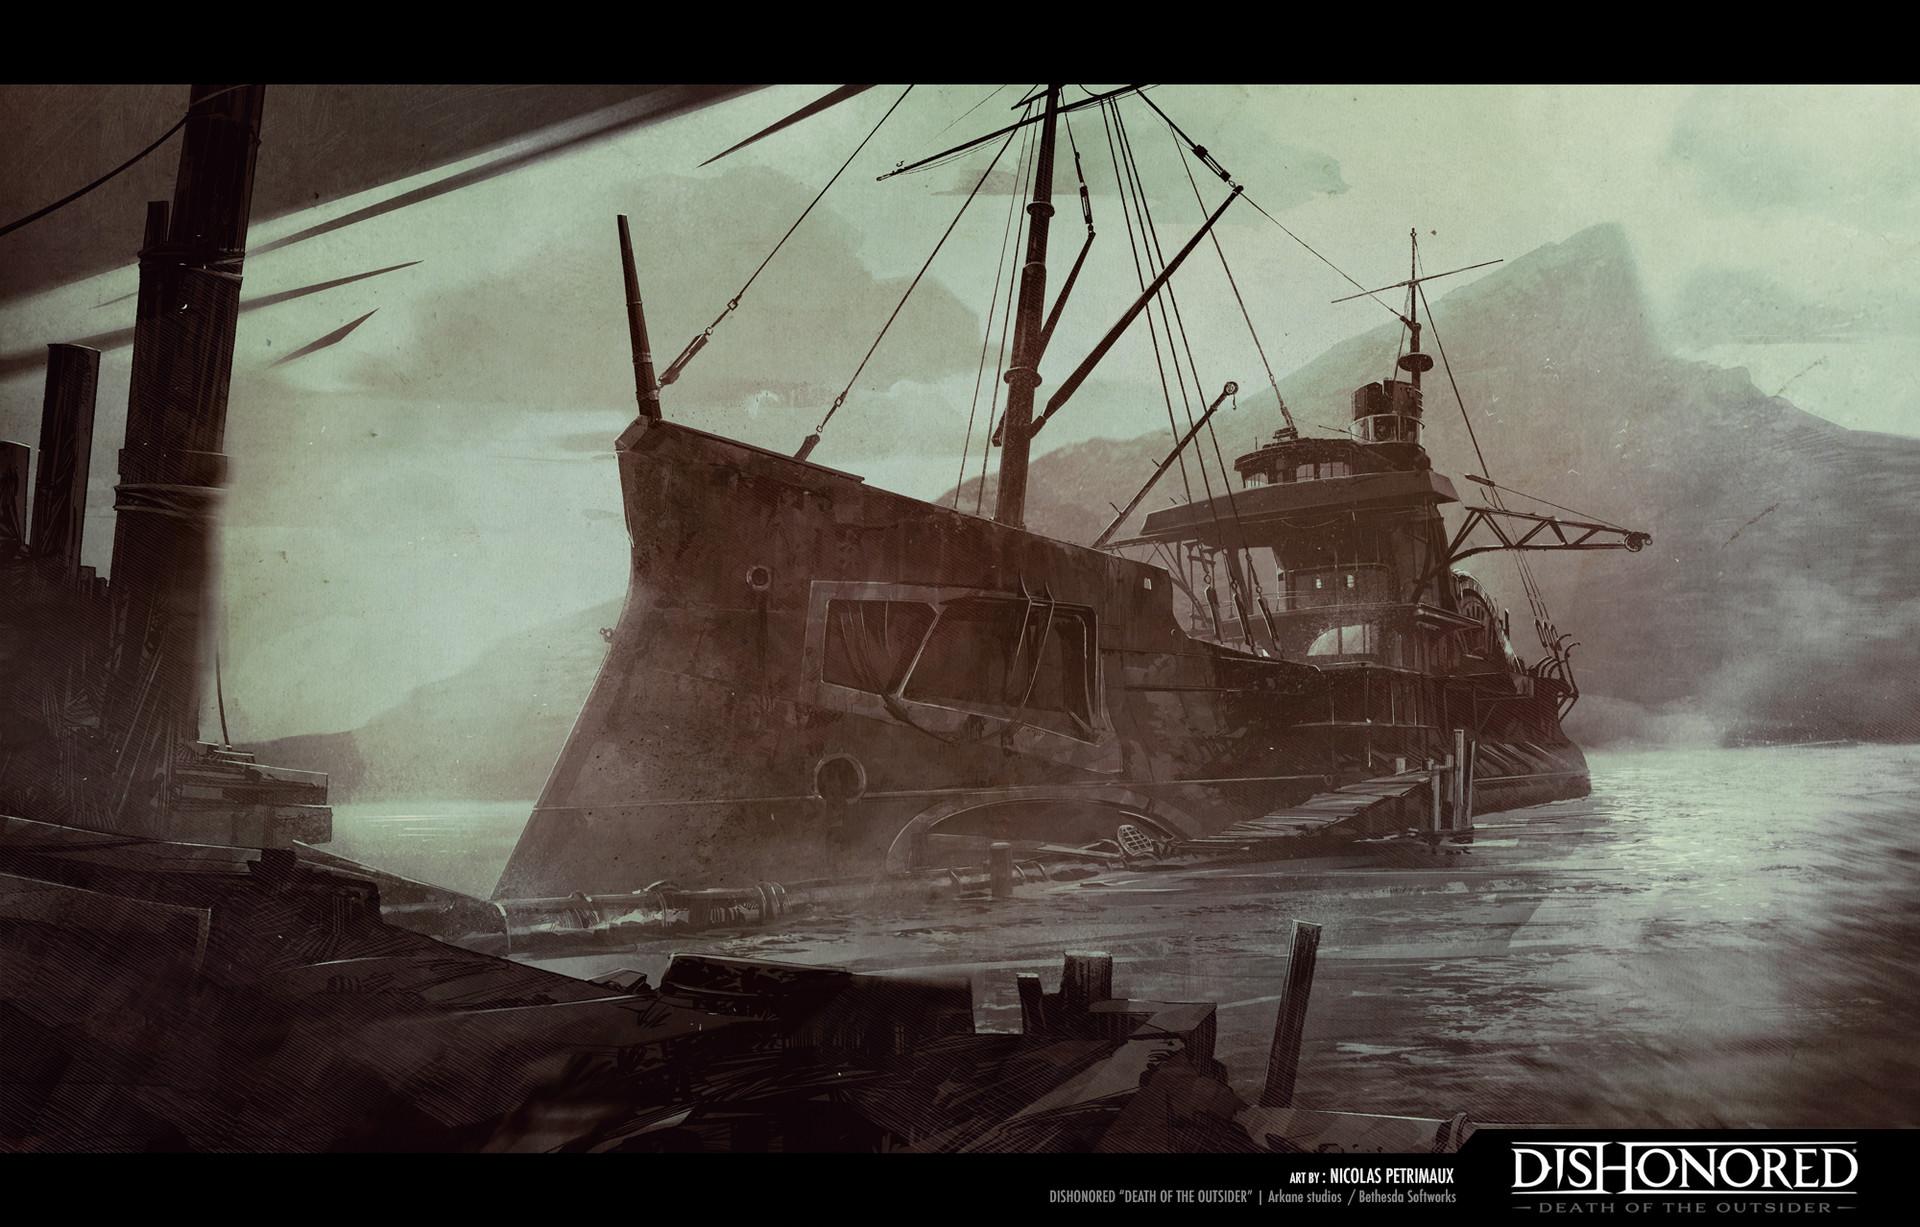 Nicolas petrimaux d2 loading dlc boat1